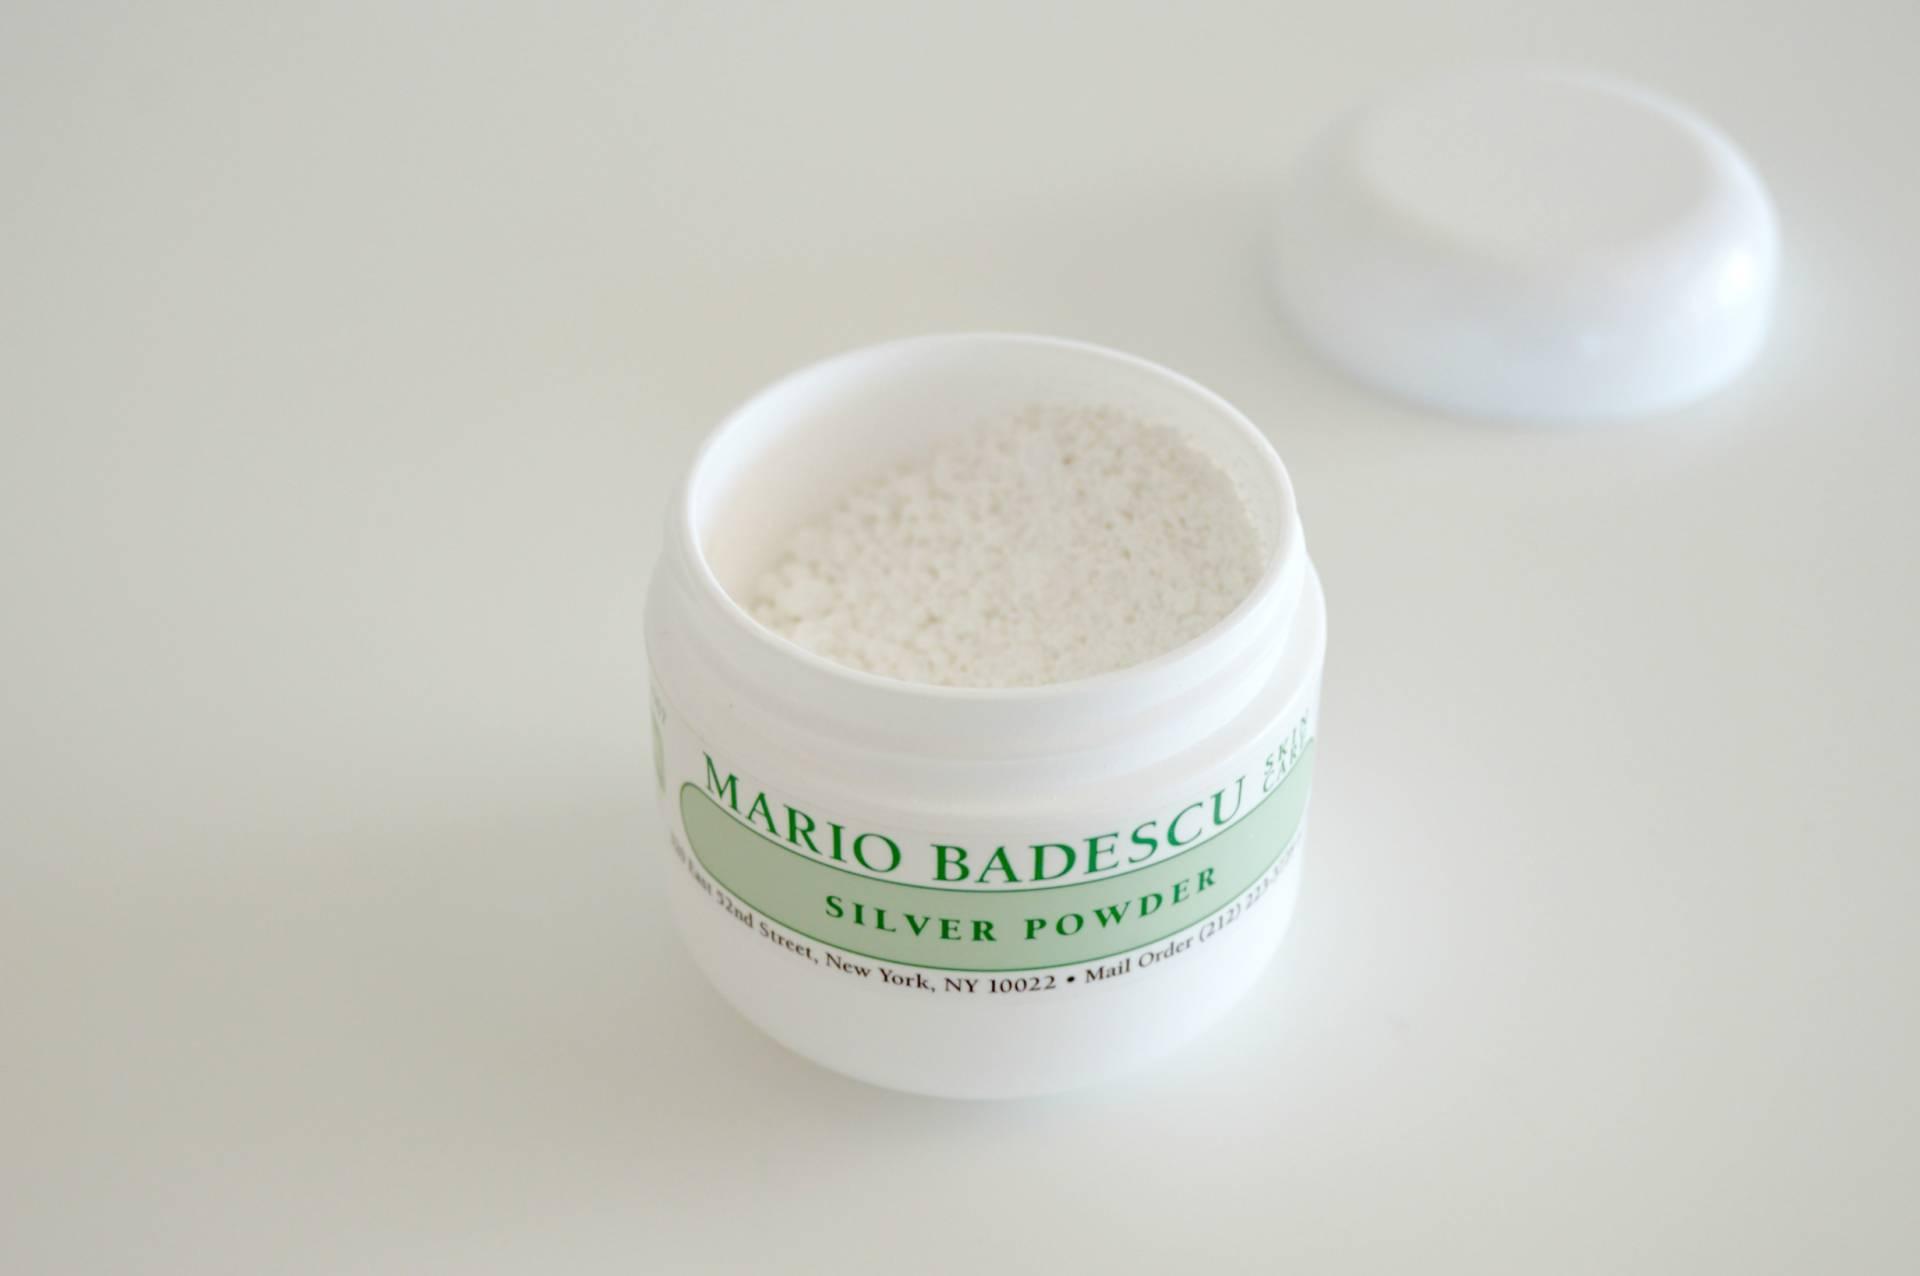 mario badescu silver powder